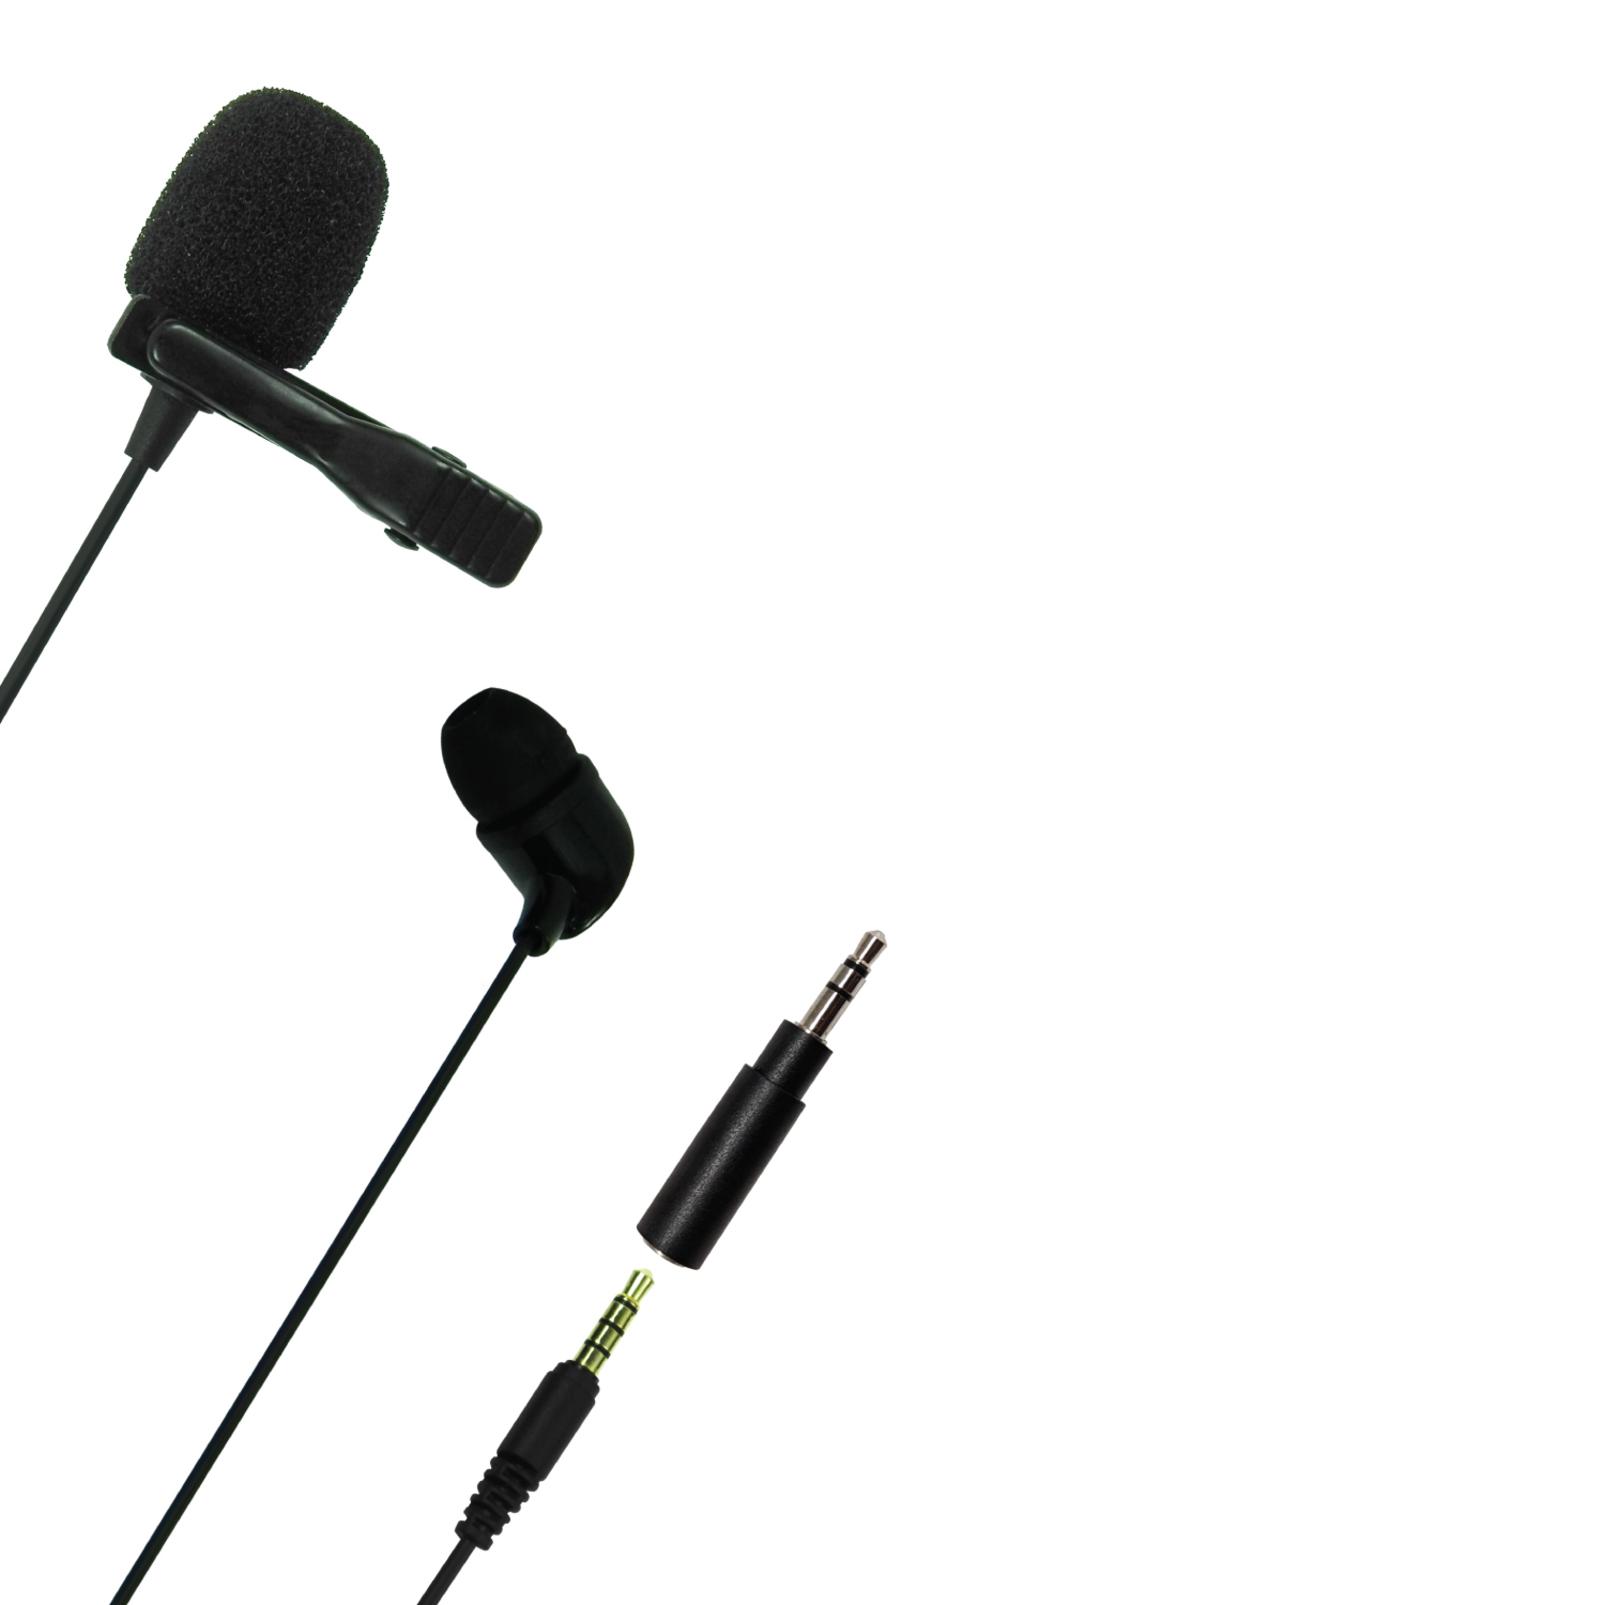 JBLCSLM20 - Black - Lavalier Microphone with Earphone - Detailshot 1